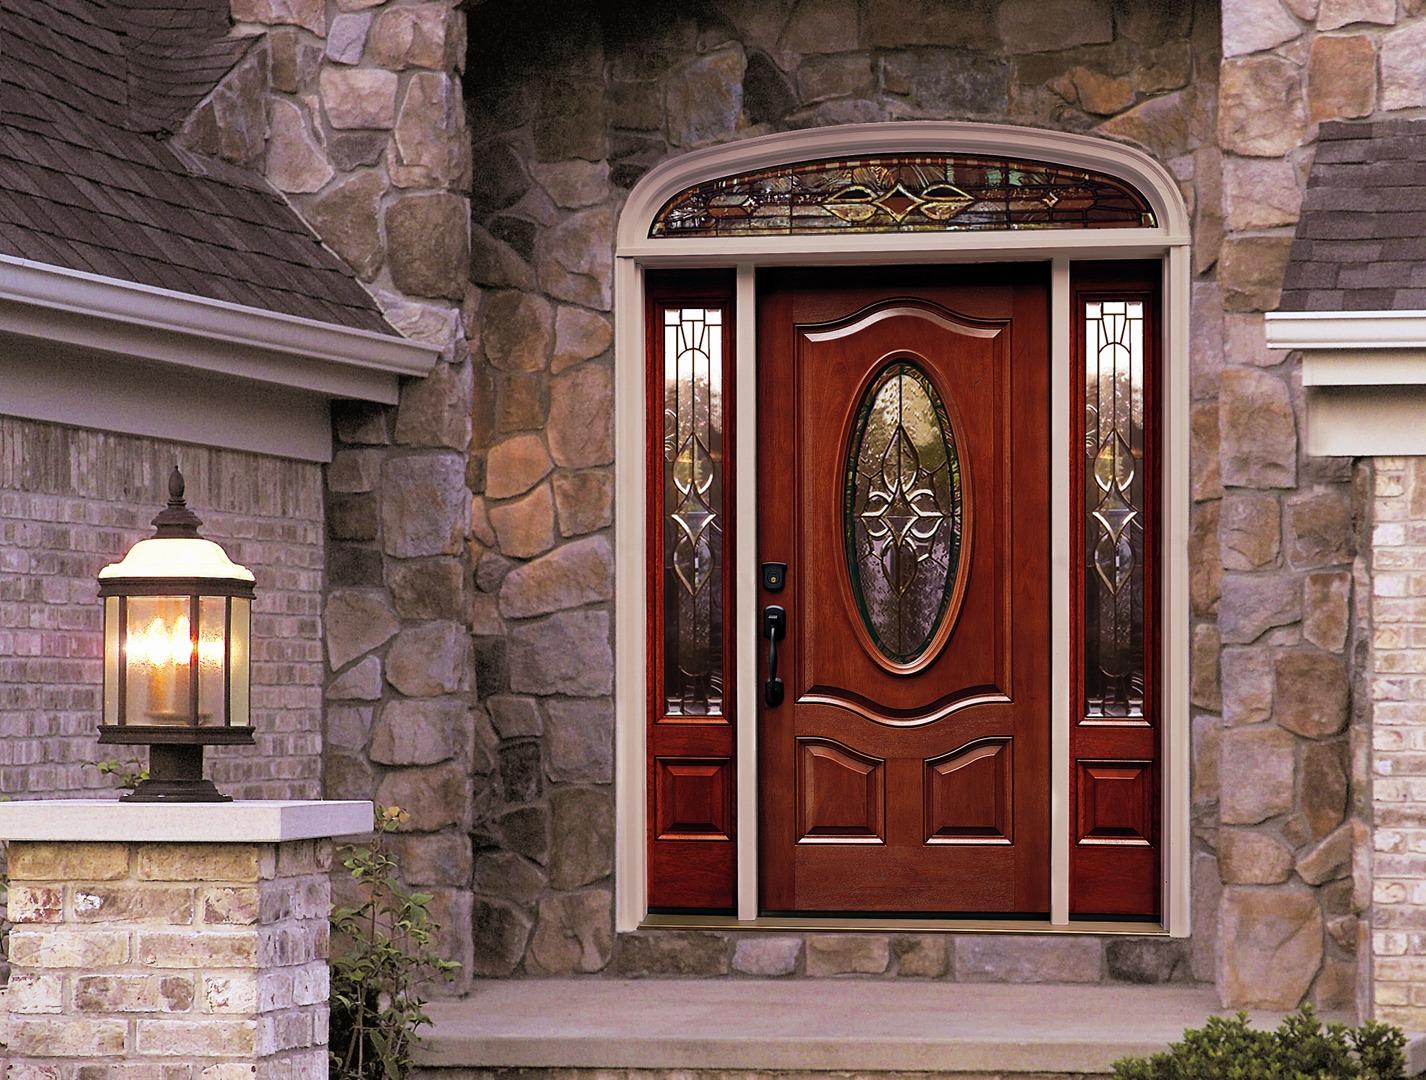 Pintu pintu logam tersuai: model besi saiz luar biasa